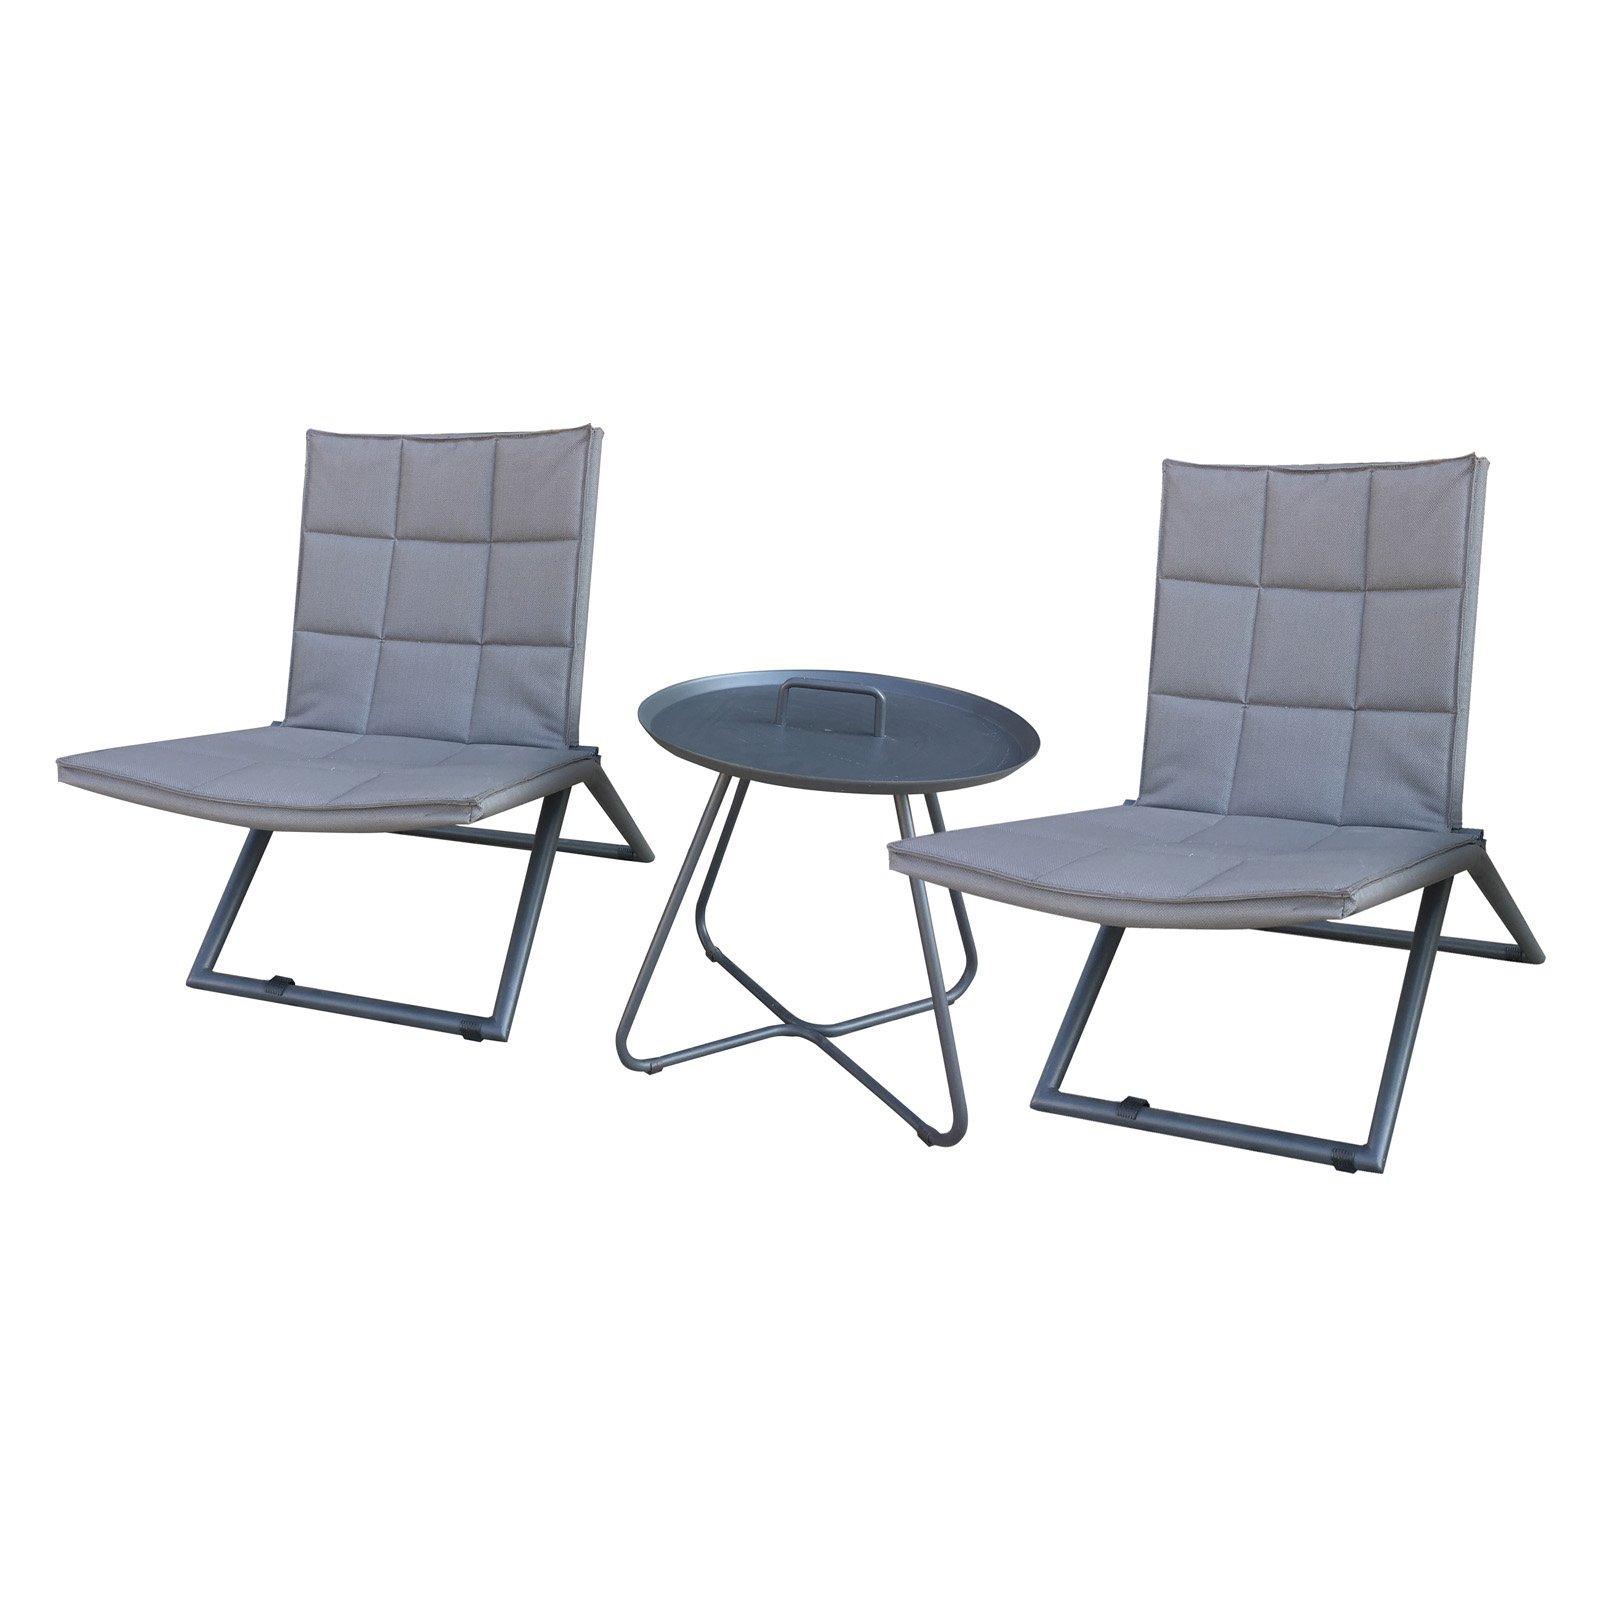 Incadozo Ravello Aluminum 3 Piece Patio Conversation Set